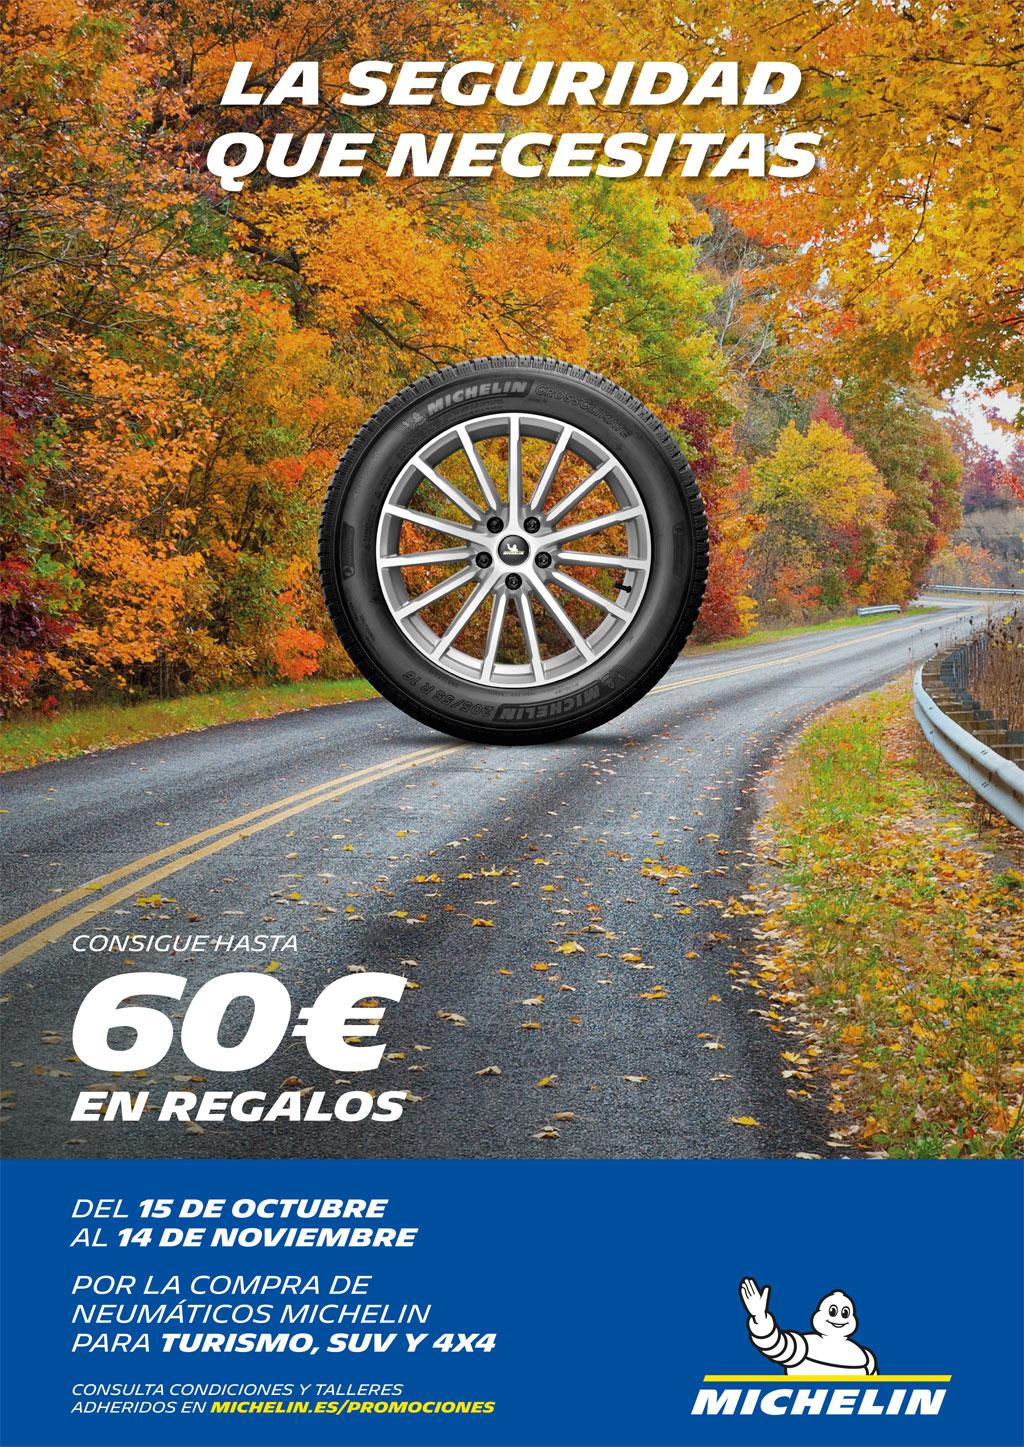 Neumáticos A. Moreno: Consigue hasta 60€ en regalos con neumáticos Michelin